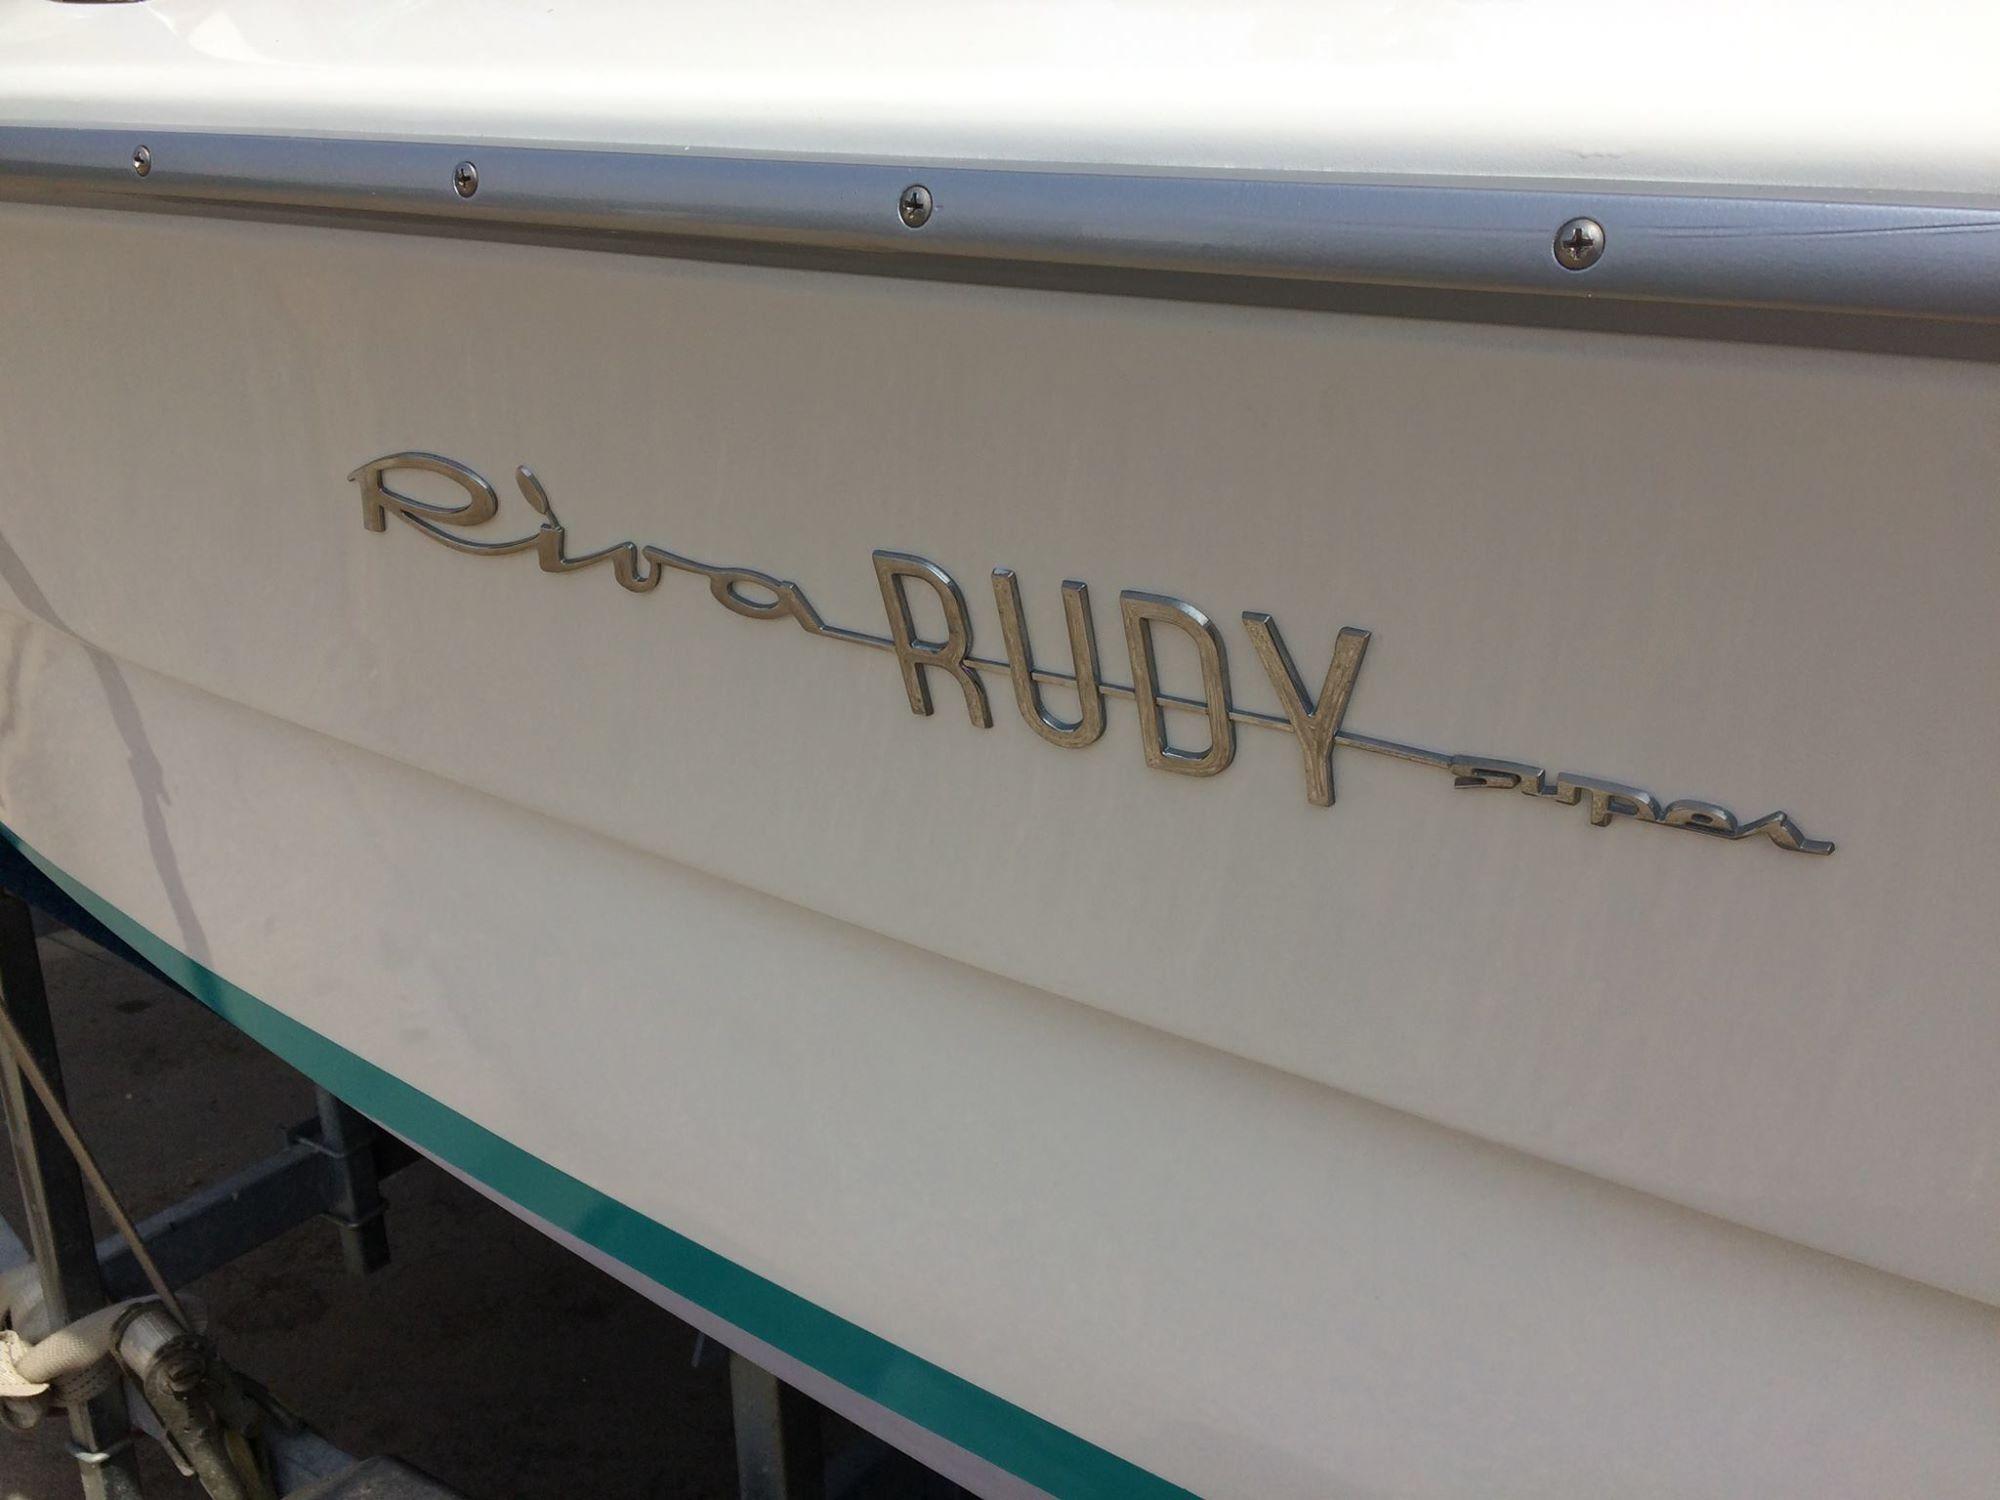 Riva Rudy boat